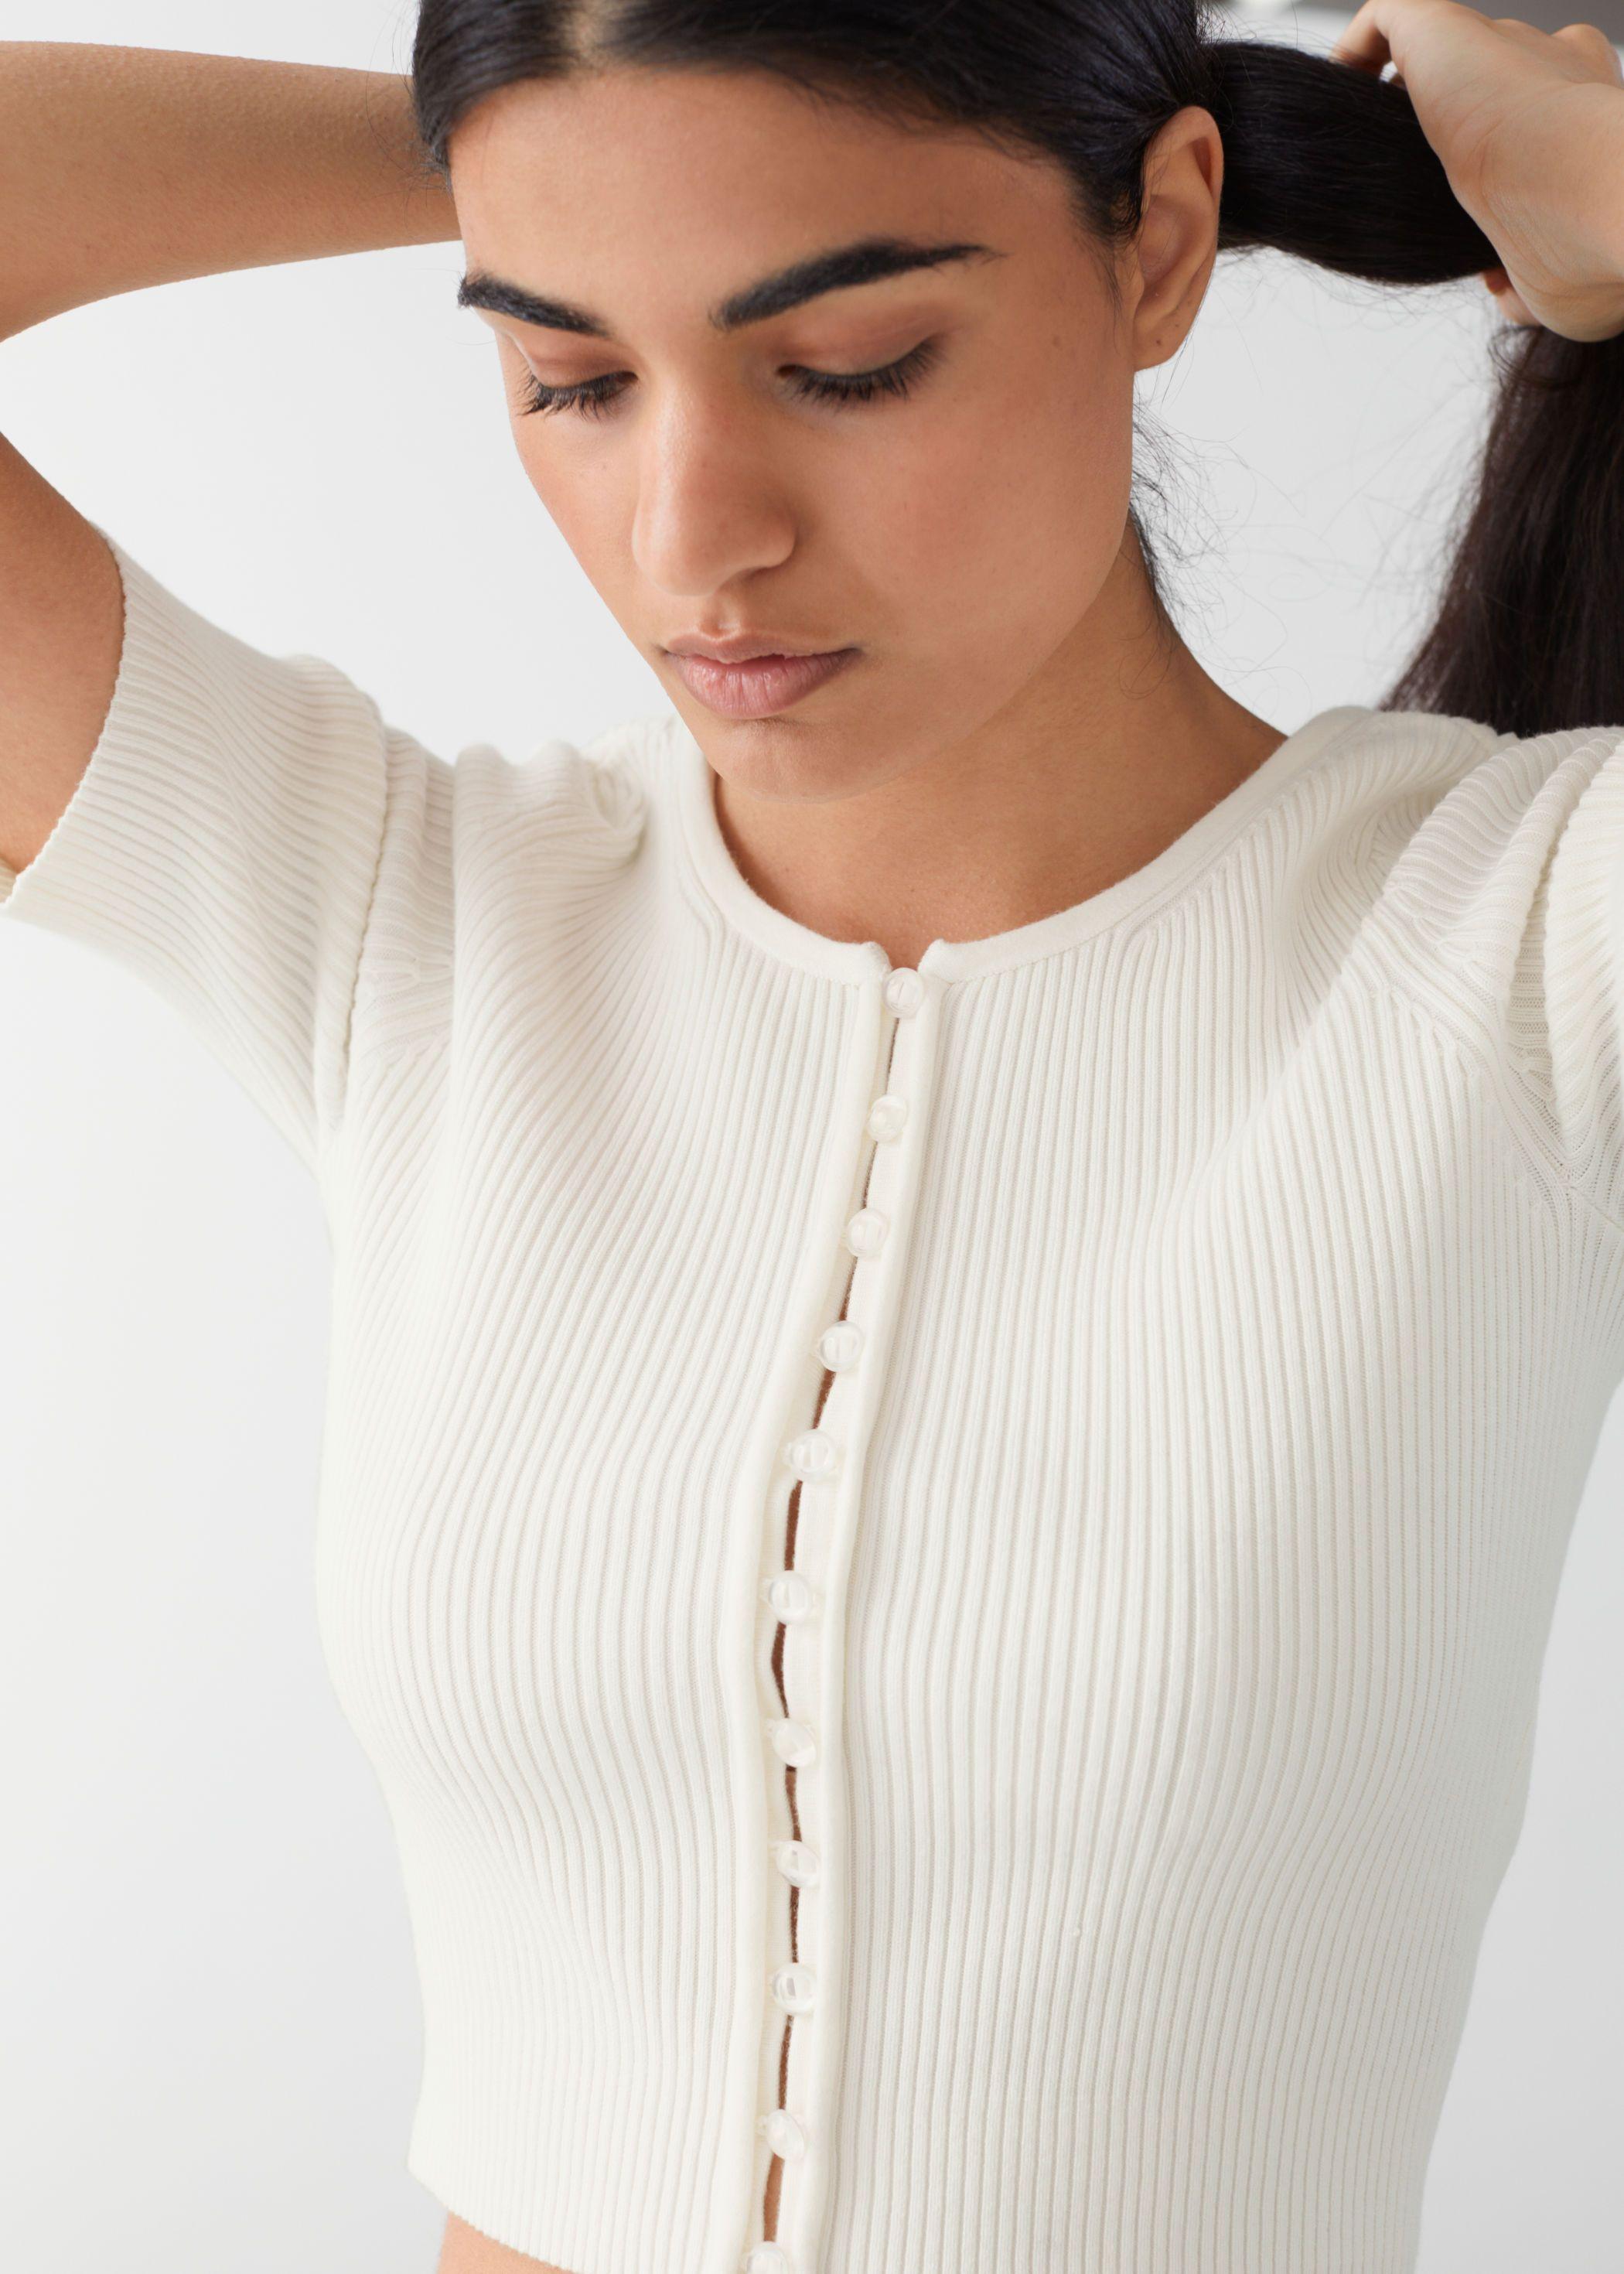 Pin On Wardrobe Reimagined 2020